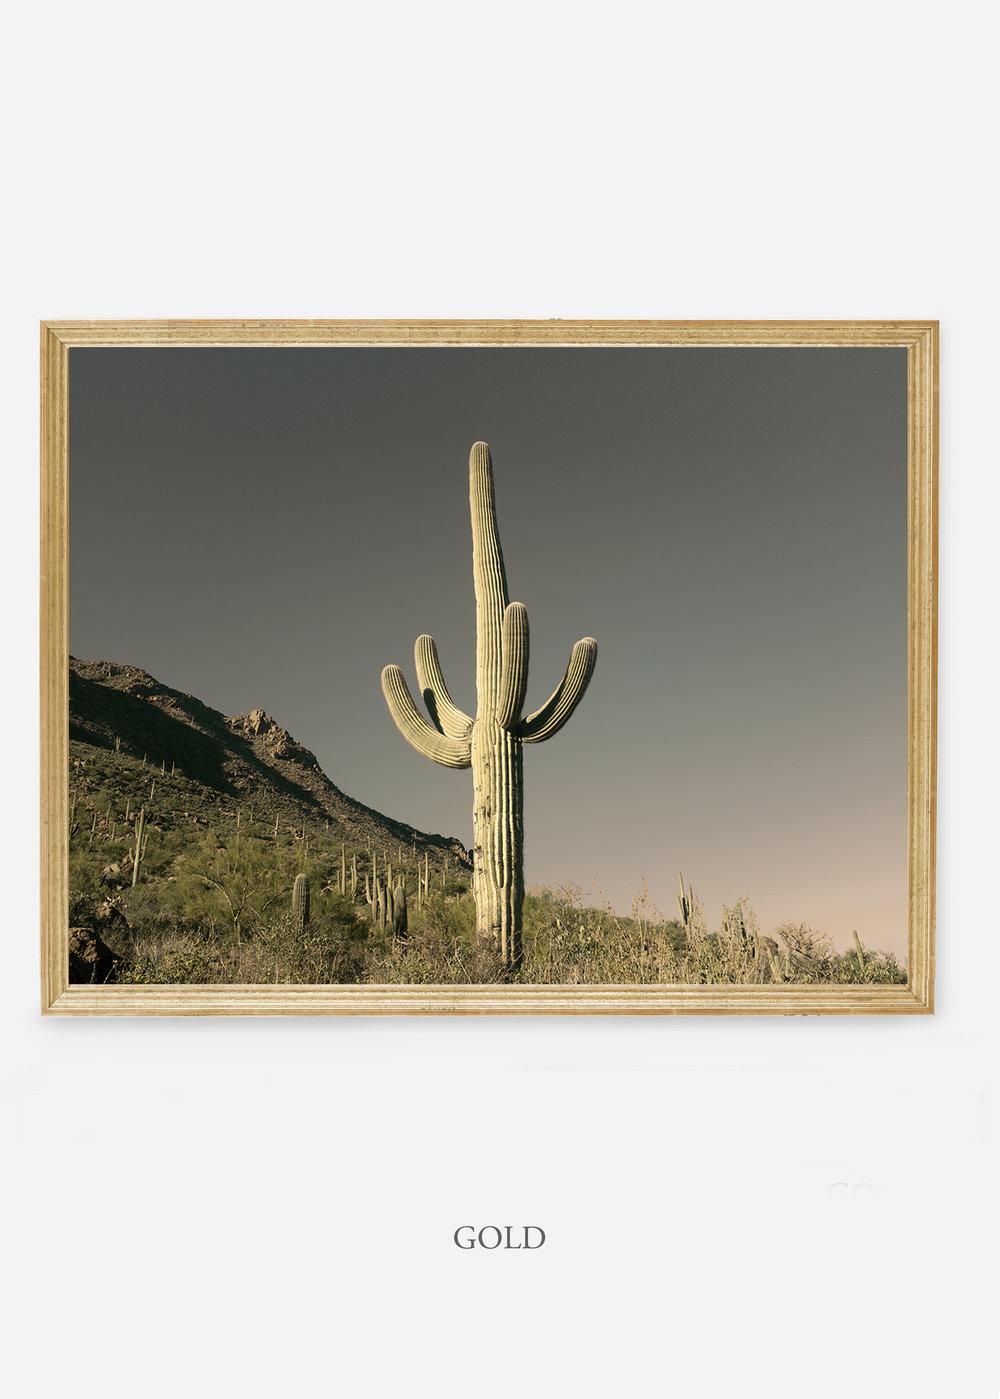 nomat-goldframe-saguaroNo.19-wildercalifornia-art-wallart-cactusprint-homedecor-prints-arizona-botanical-artwork-interiordesign.jpg